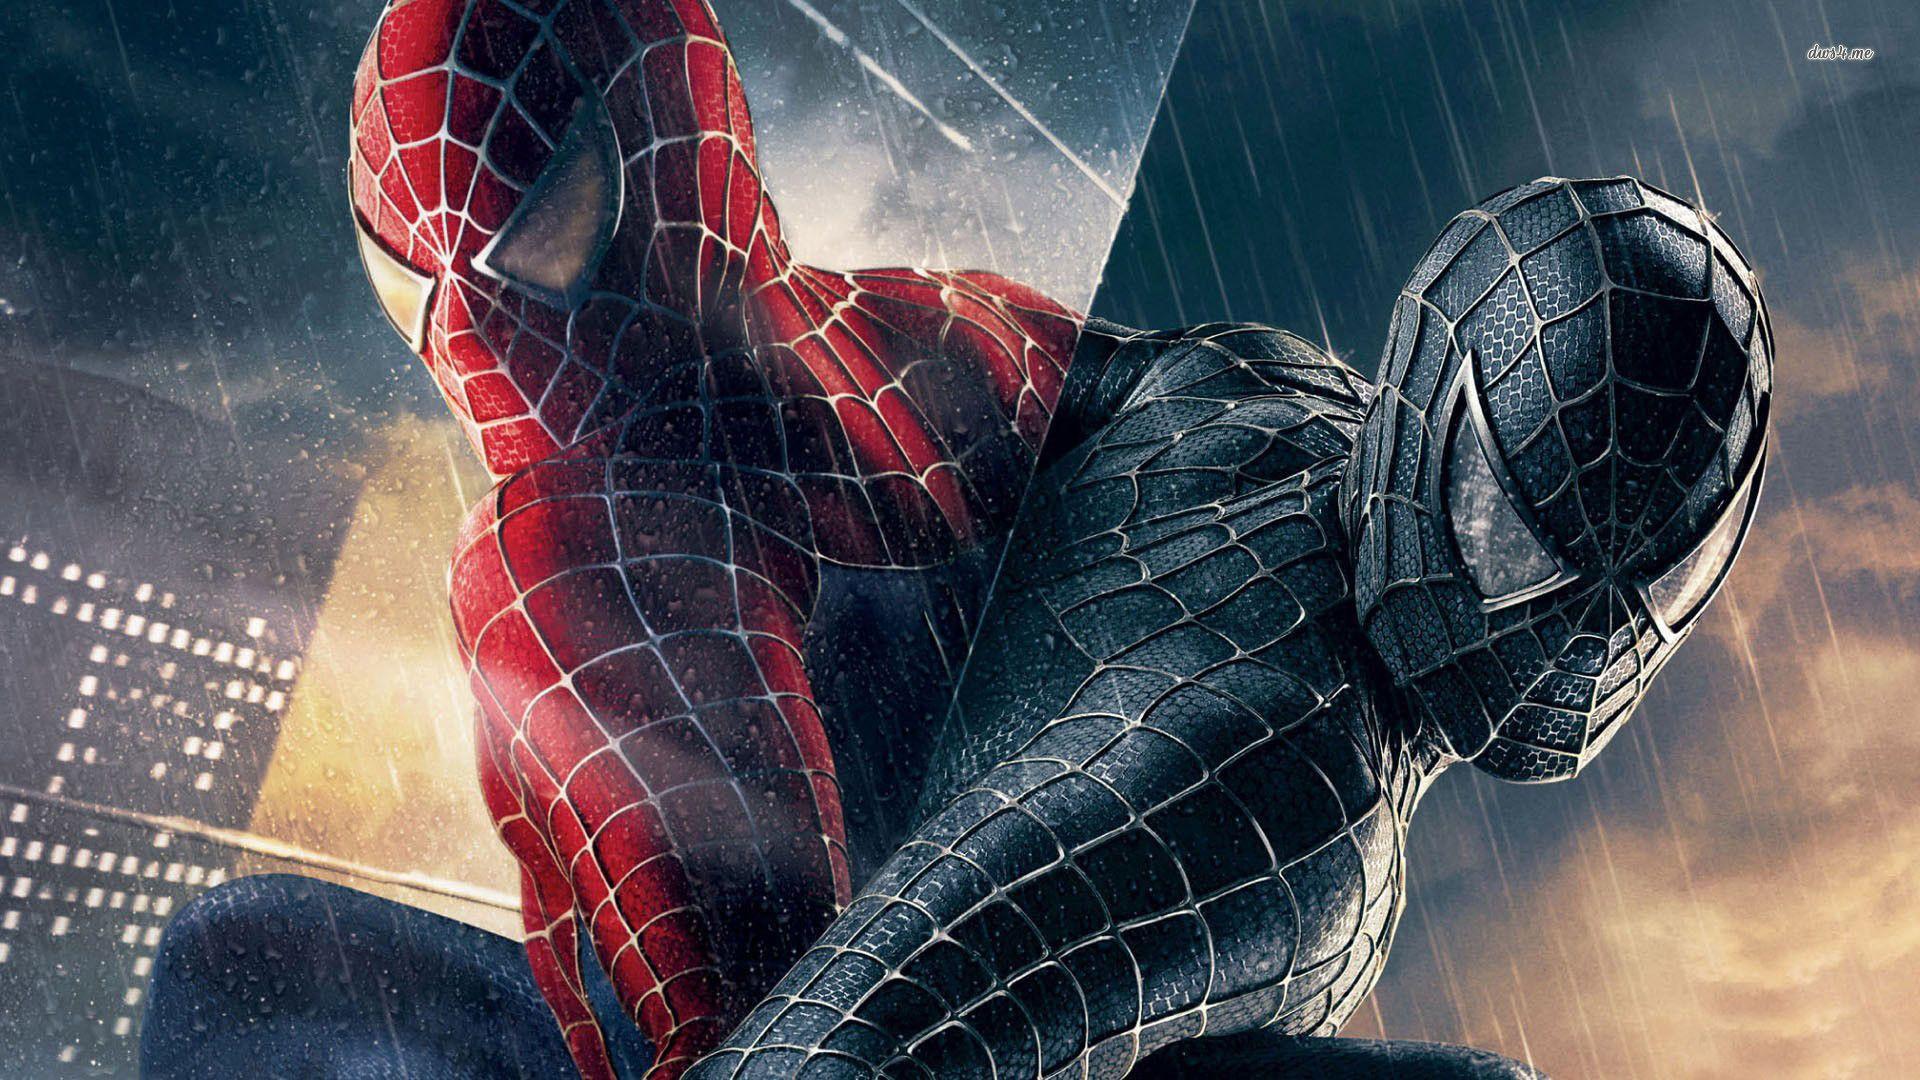 Spider Man 3 4k 1920x1080 Wallpaper Teahub Io